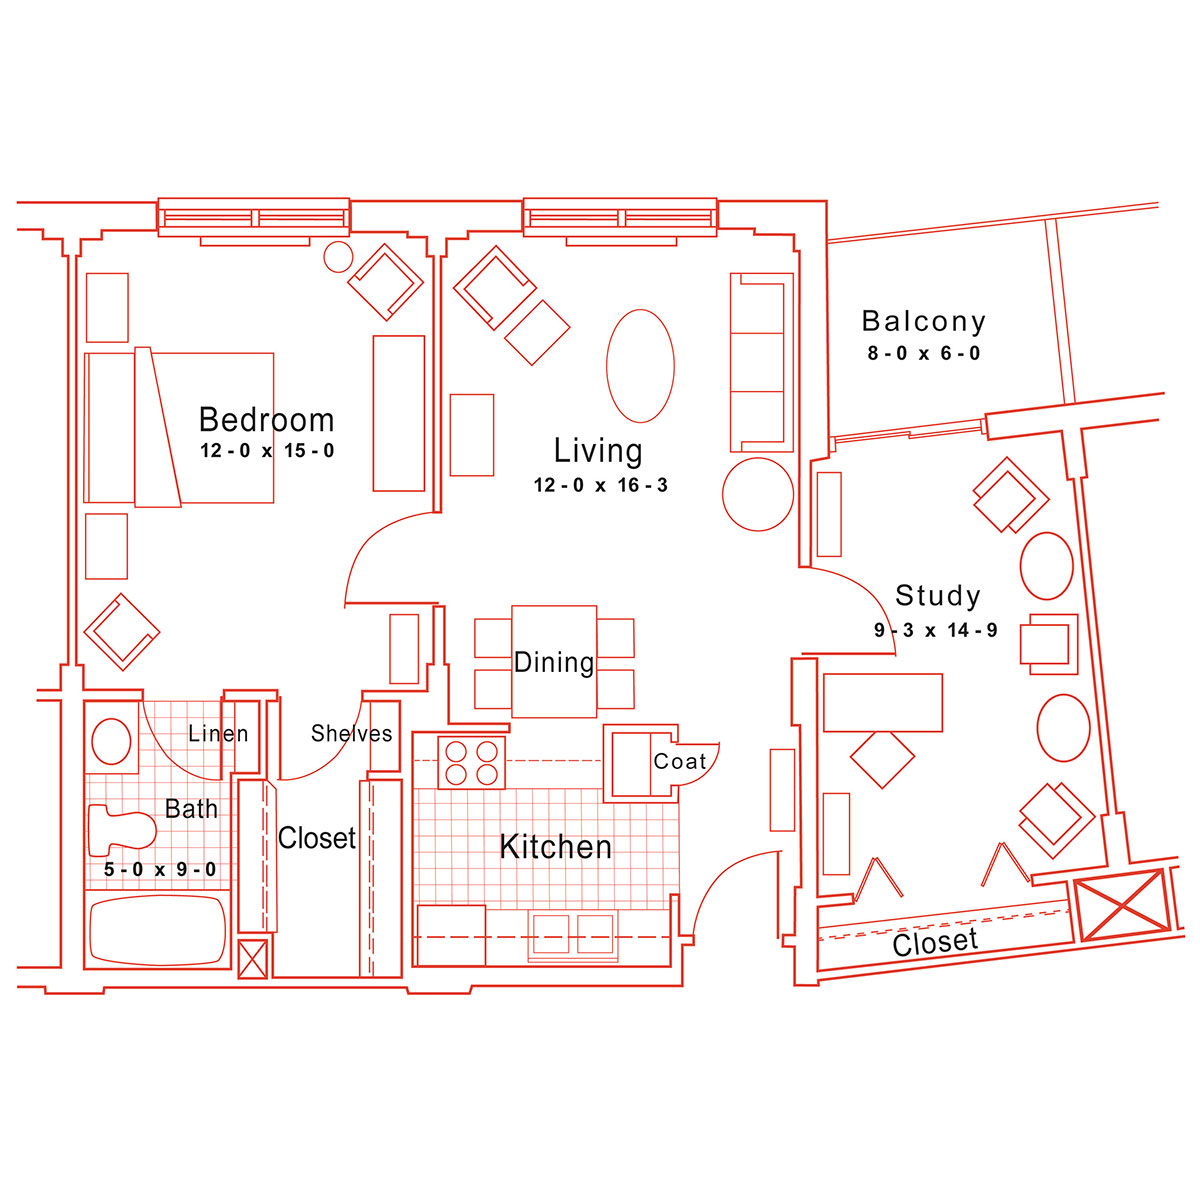 floor plans king sbridge retirement community floor plans appleton retirement communityappleton